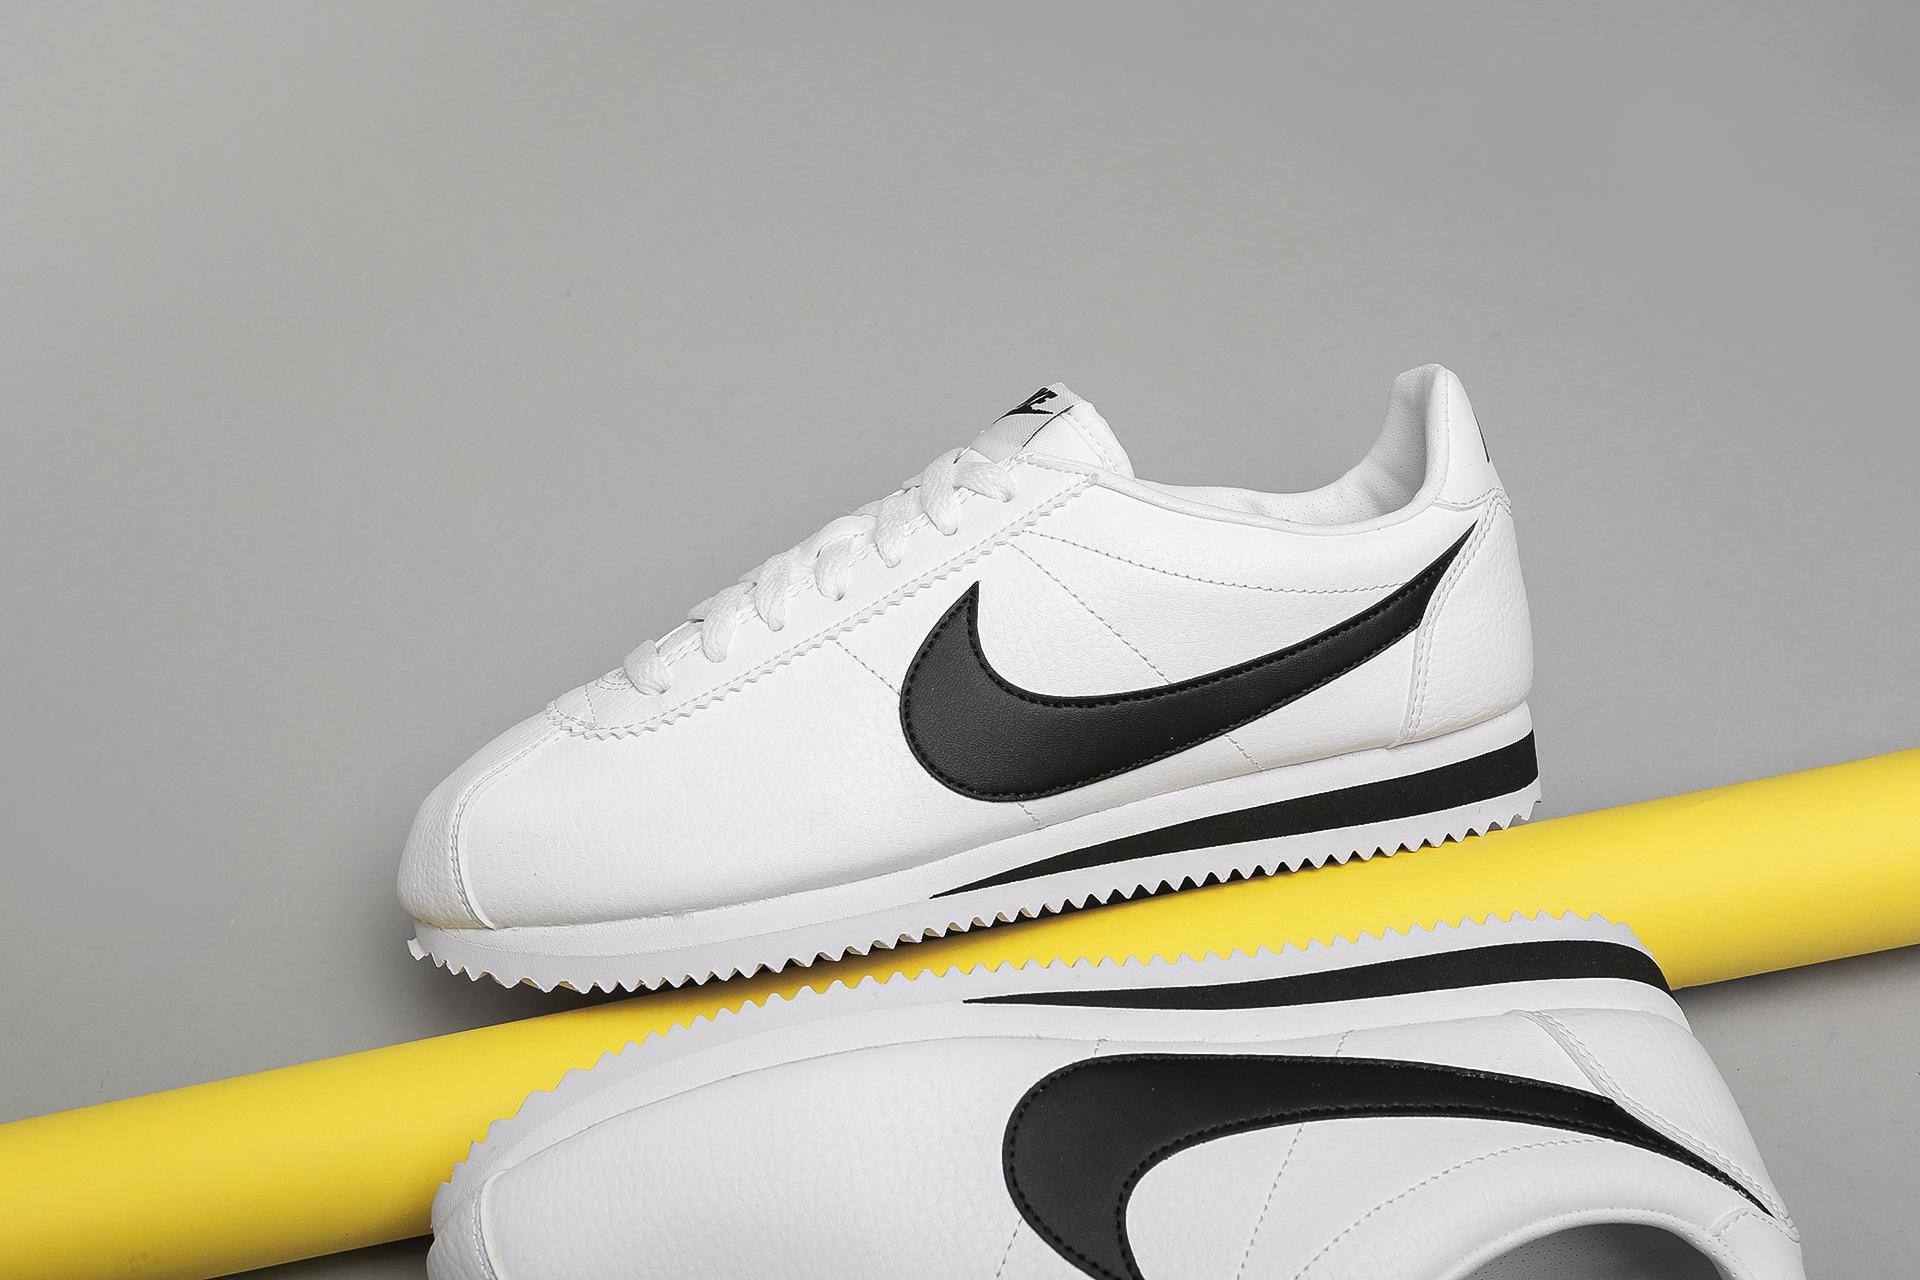 e60ffe7d ... Купить мужские белые кроссовки Nike Classic Cortez Leather - фото 3  картинки ...